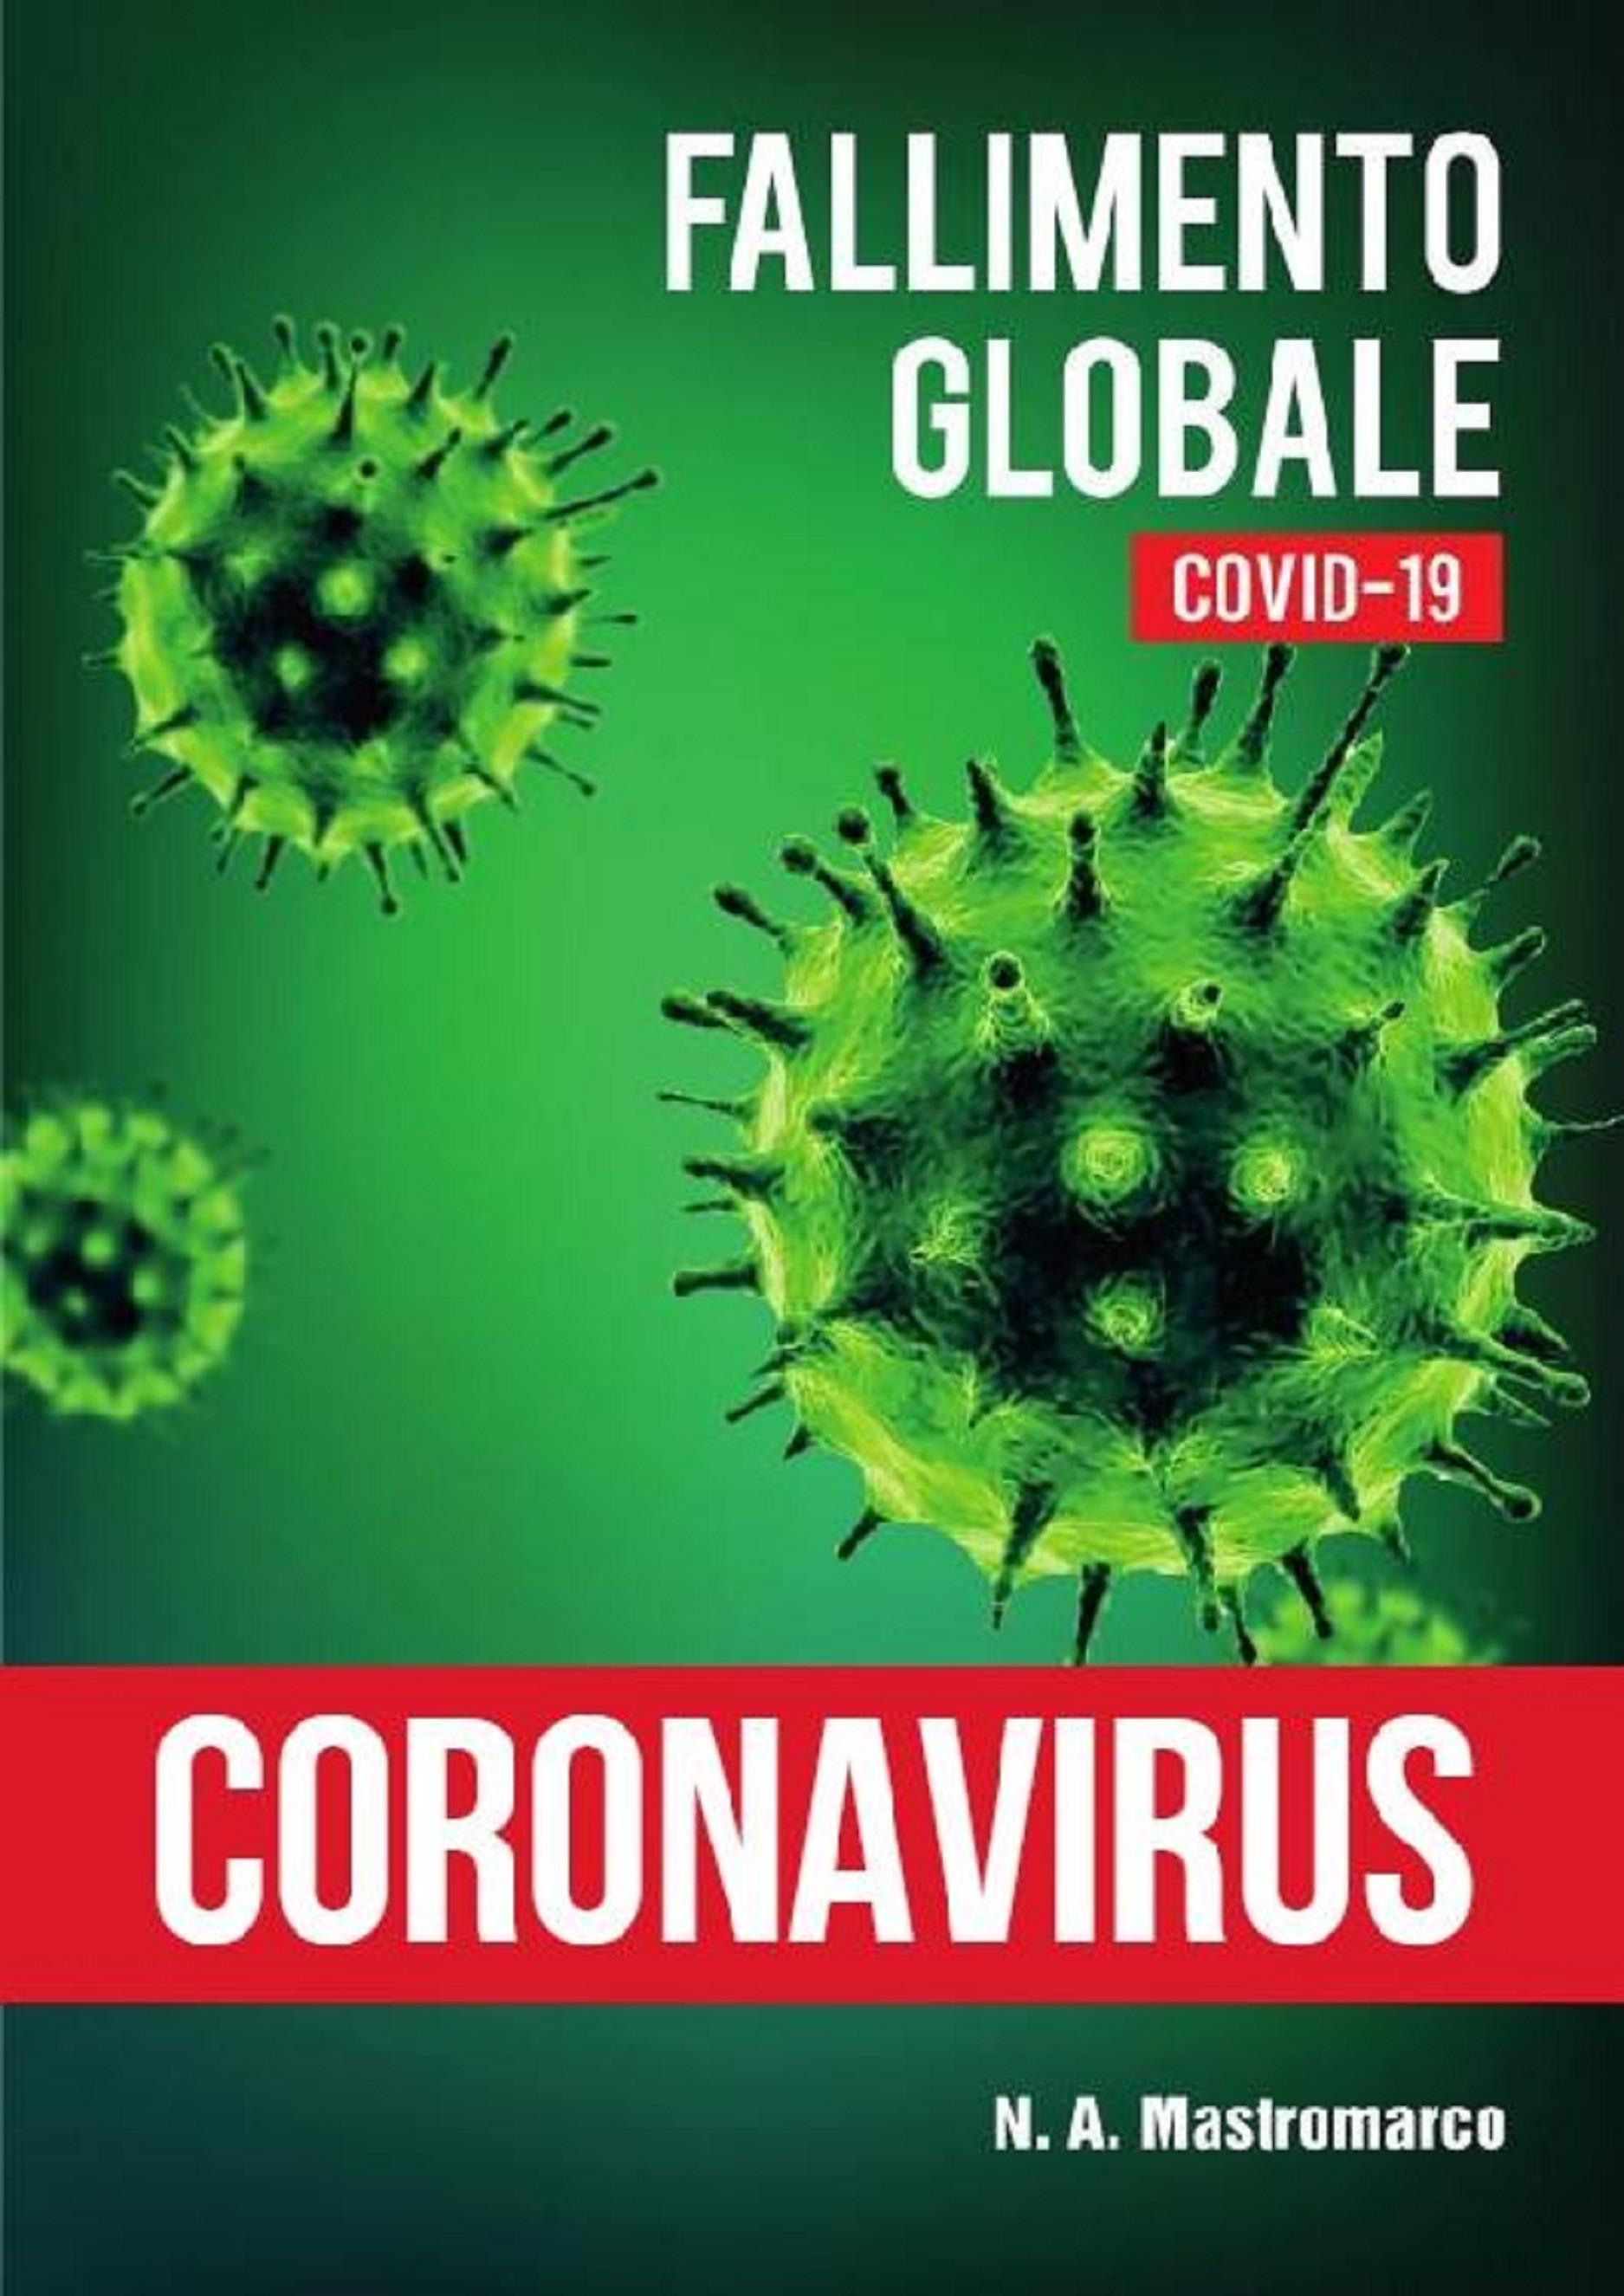 Fallimento Globale: Coronavirus